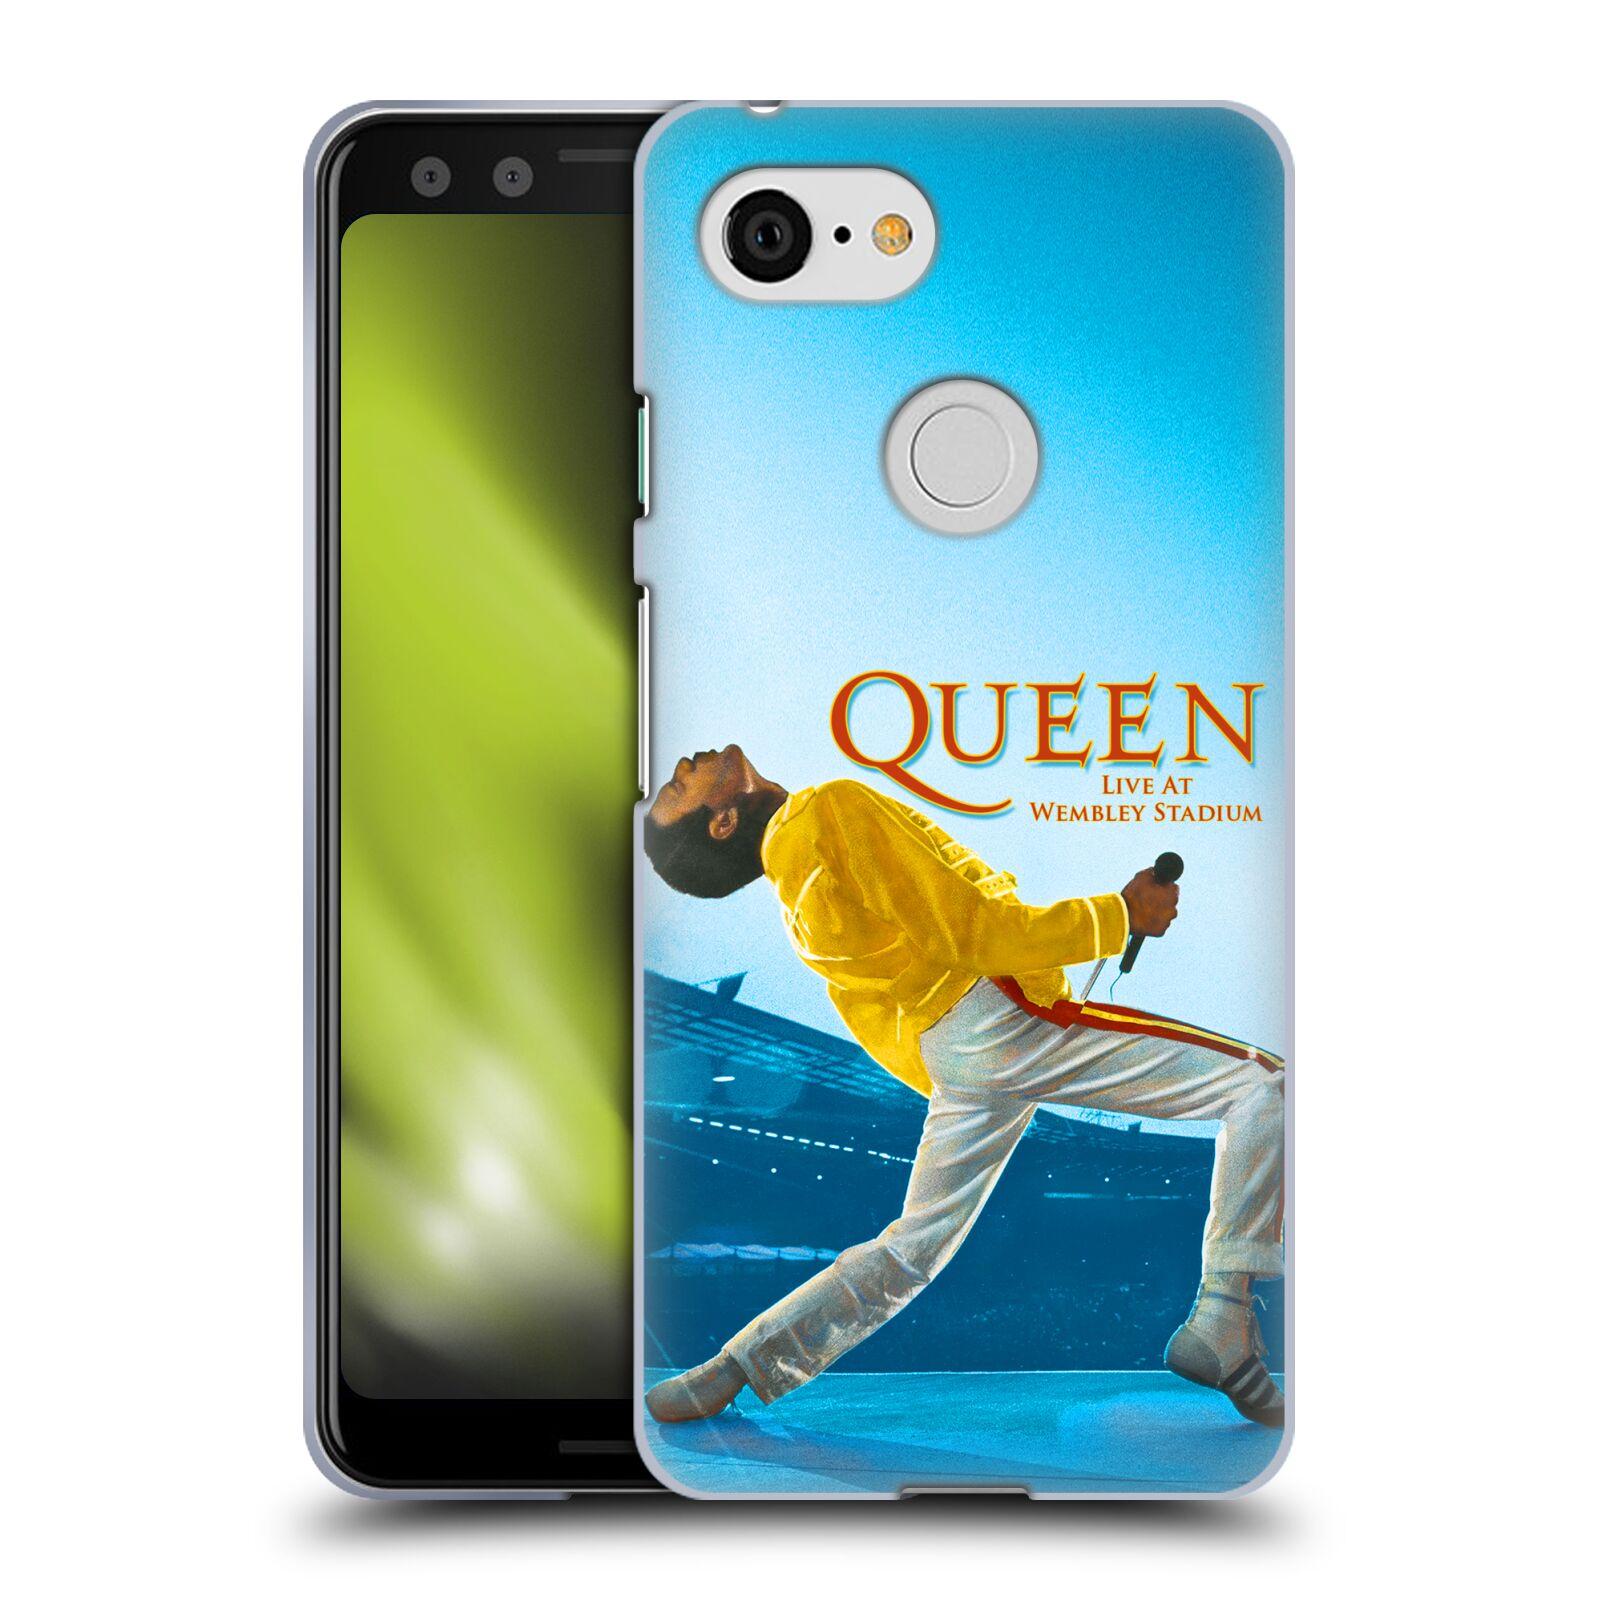 Silikonové pouzdro na mobil Google Pixel 3 - Head Case - Queen - Freddie Mercury